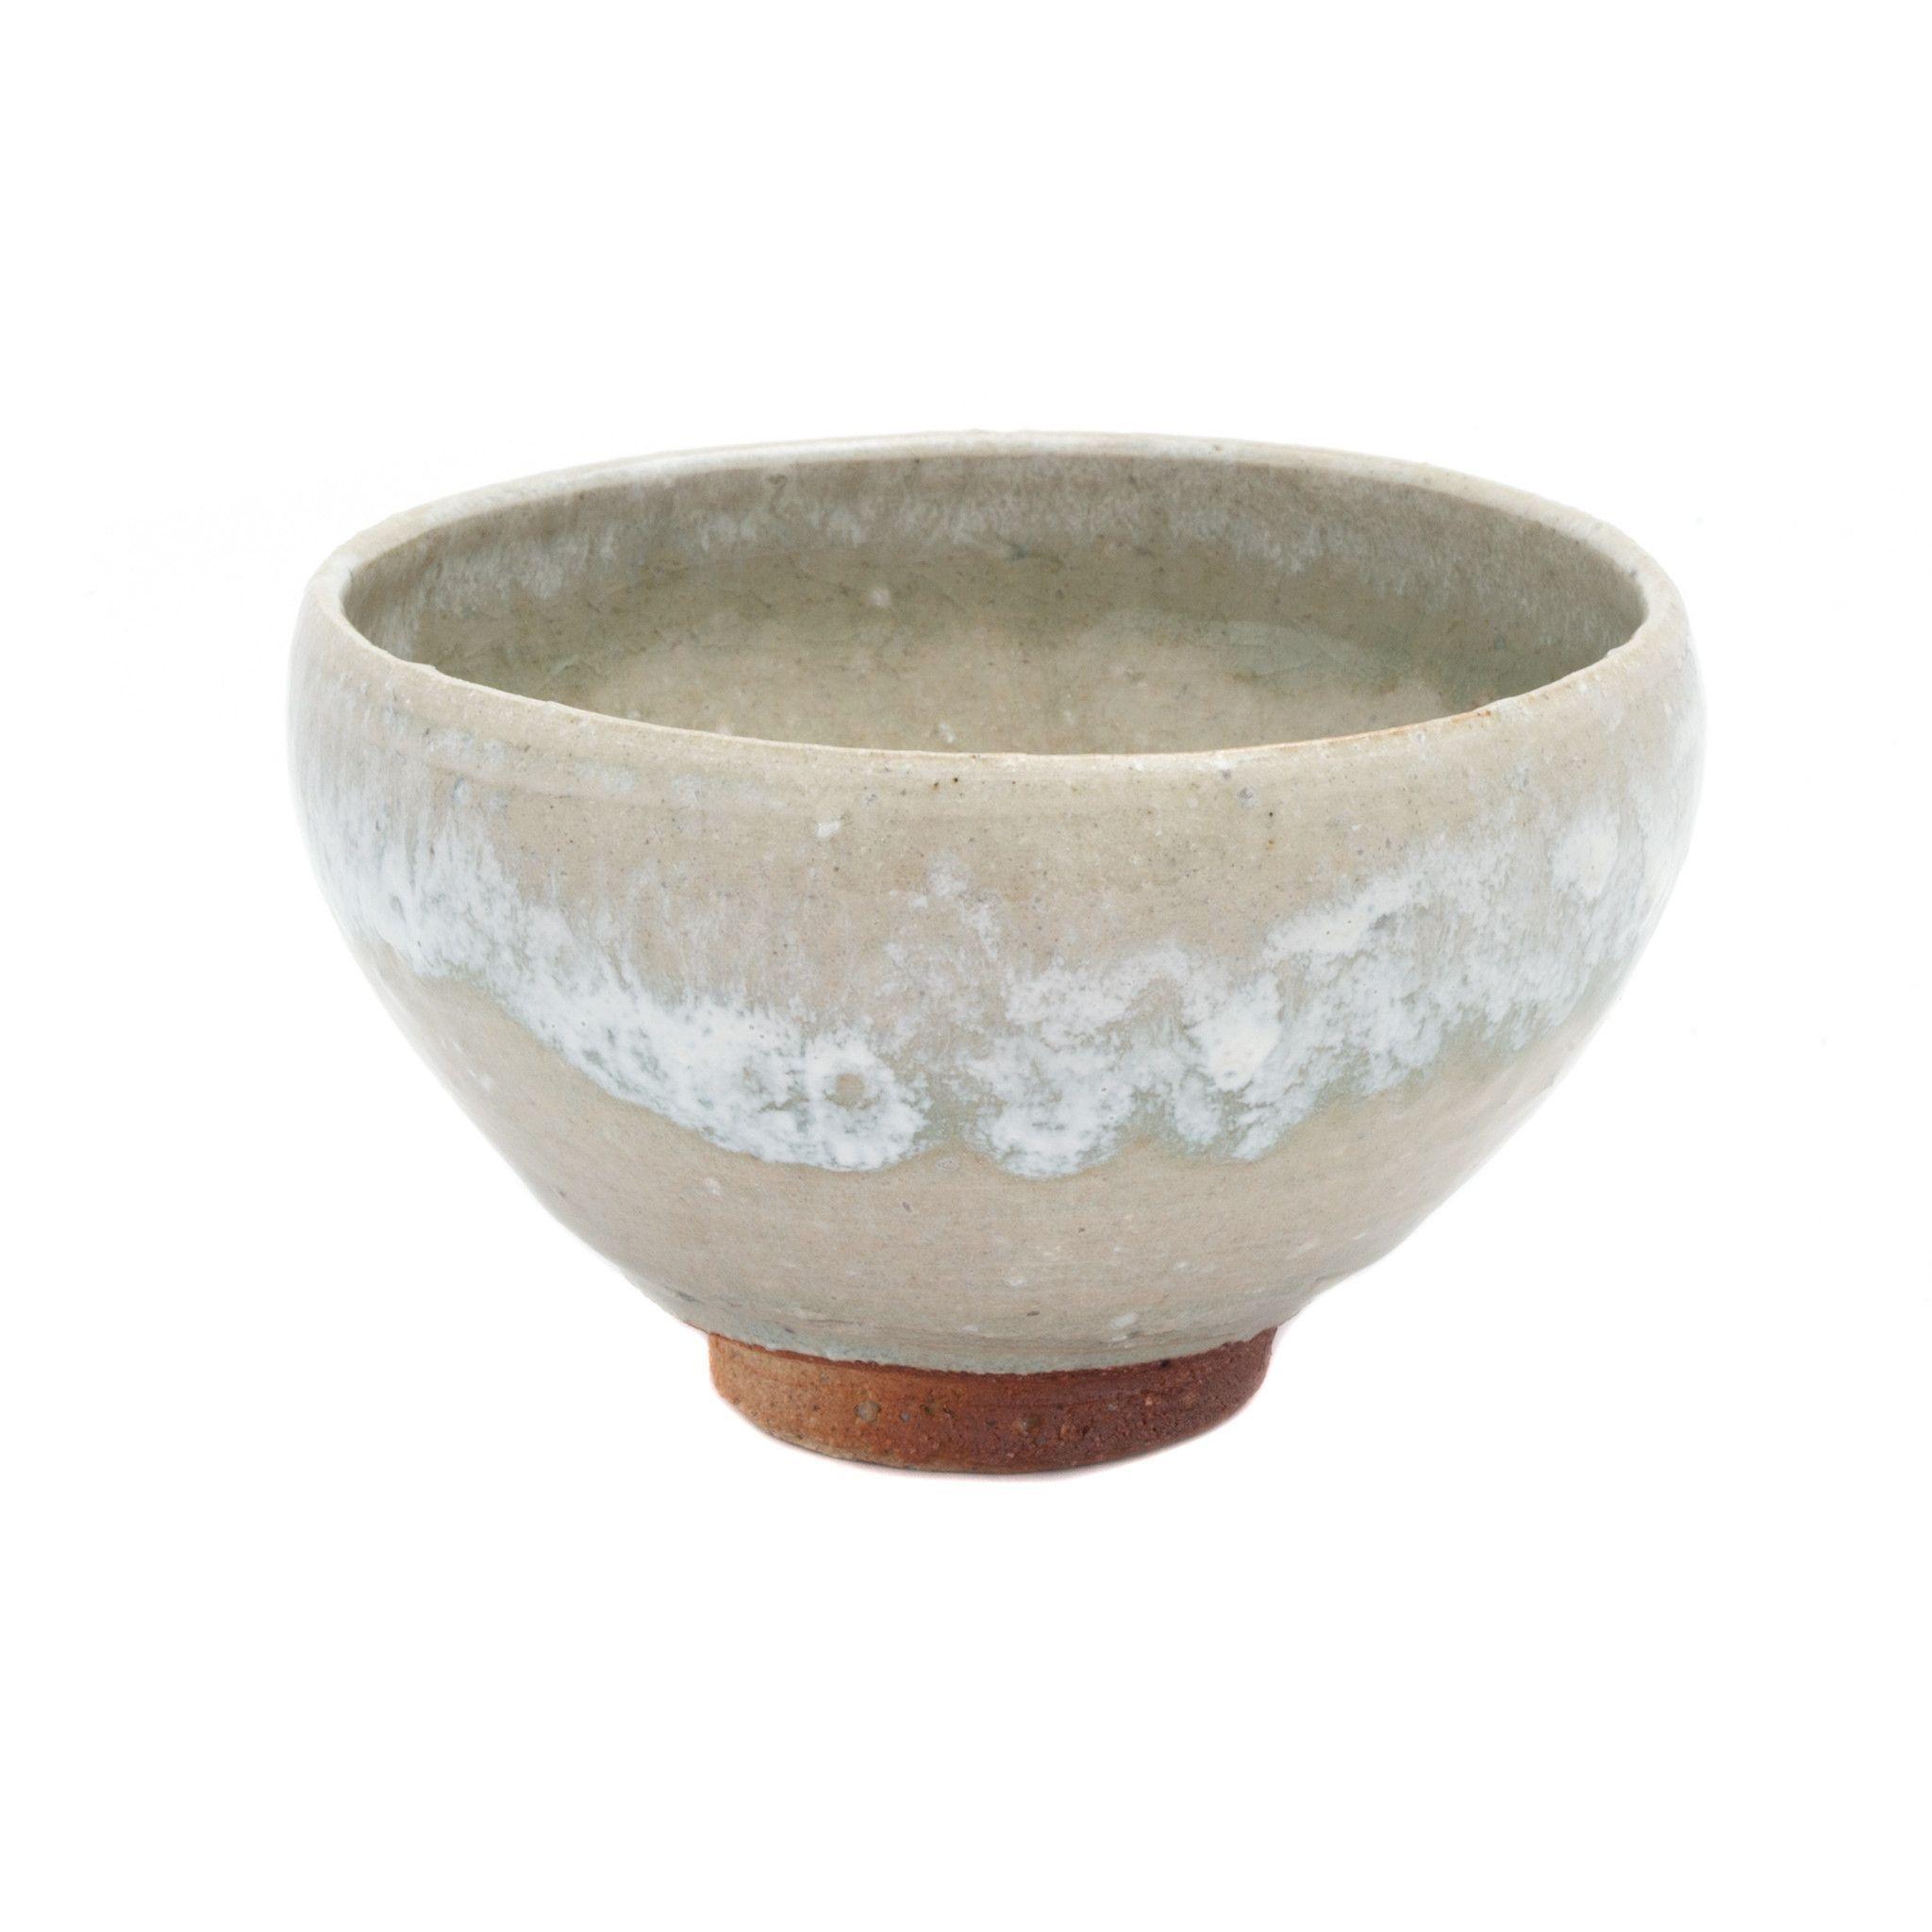 Origin: Mashiko, Japan Mashiko tea bowl made by Mingei artist Ishikawa Hajime. Beautiful glazing drips all around and inside and exposed earth foot at the bottom. Slightly rounded body.